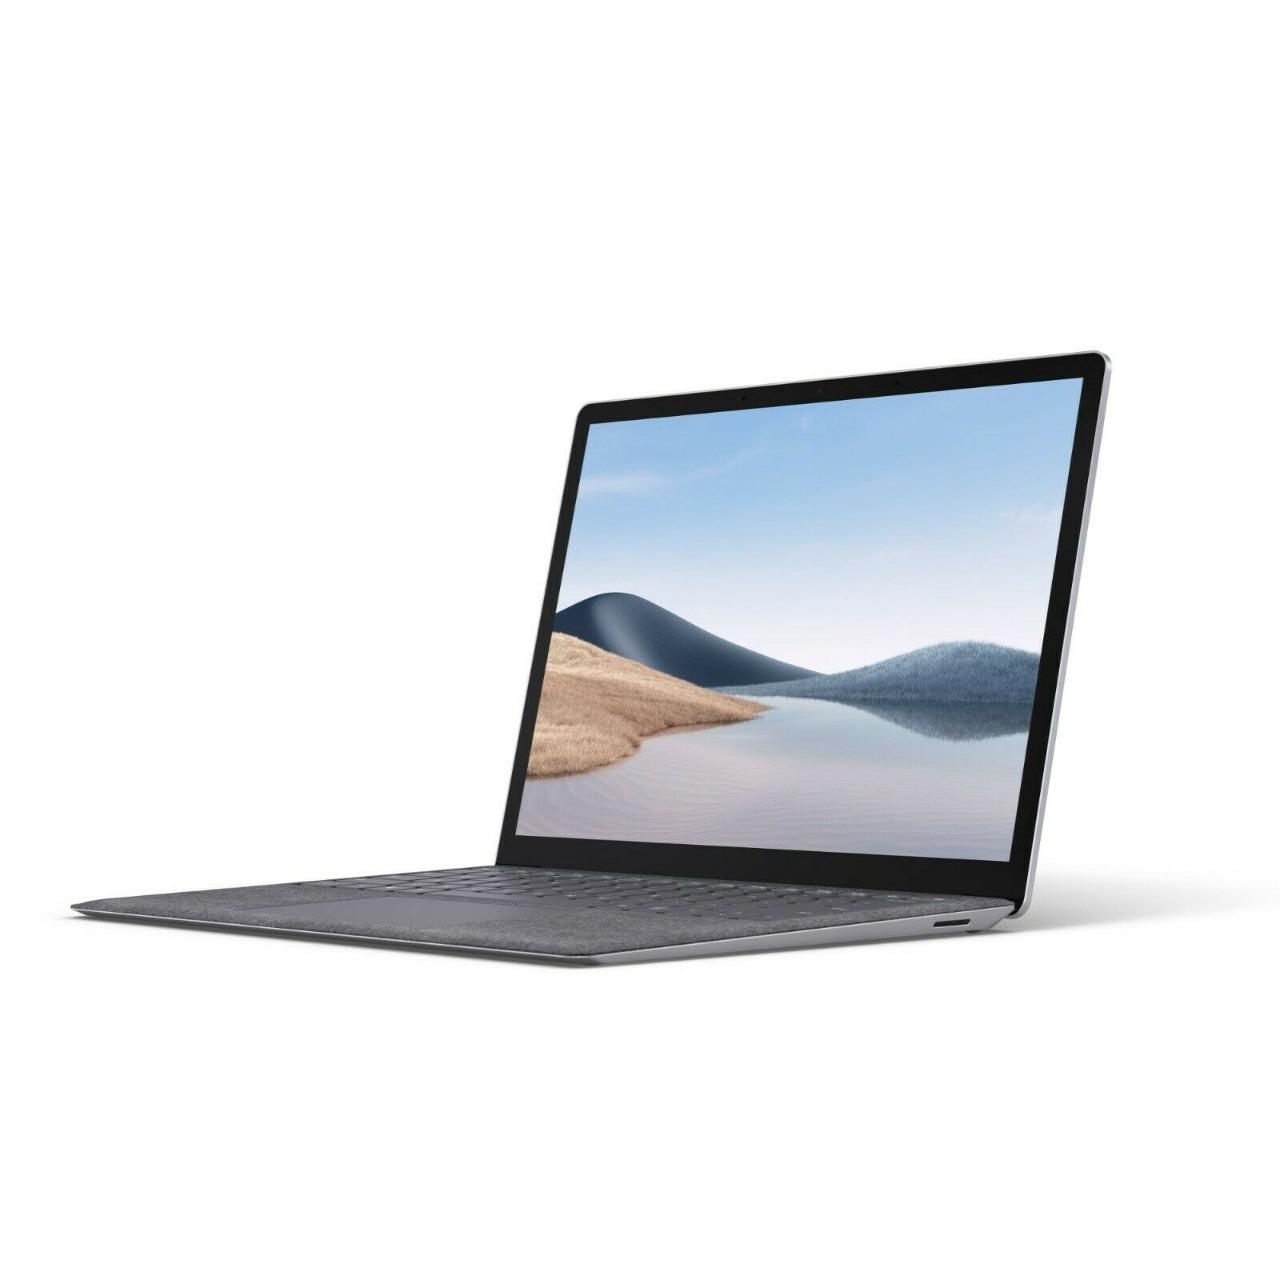 Microsoft Surface laptop 4 13.5 core i5 16gb 512gb Platium